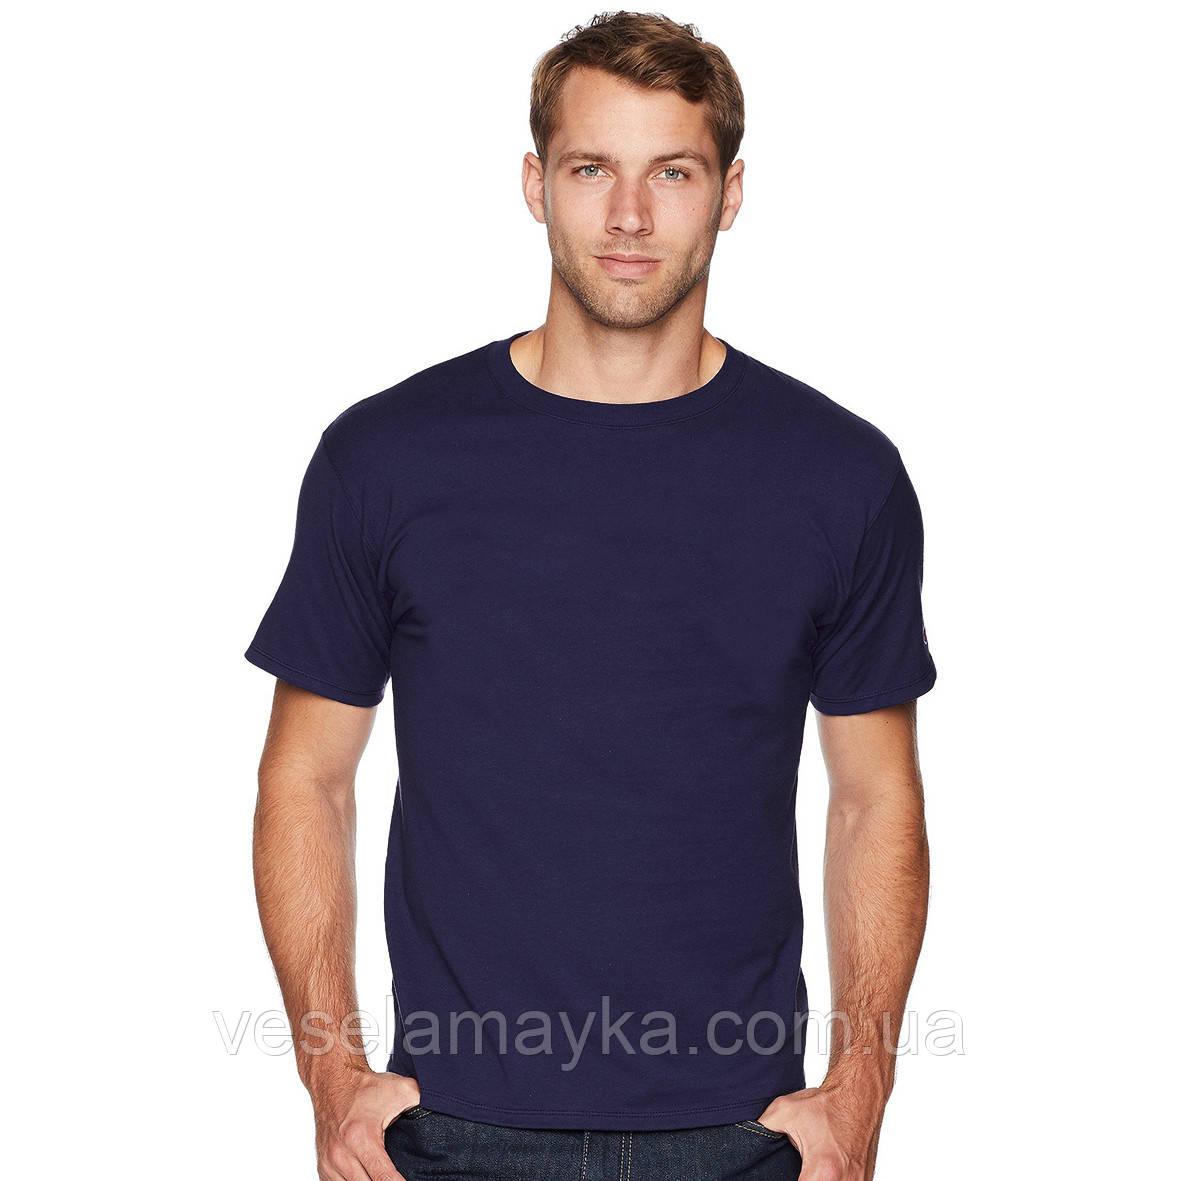 Уплотненная глубоко темно-синяя мужская футболка (Премиум)